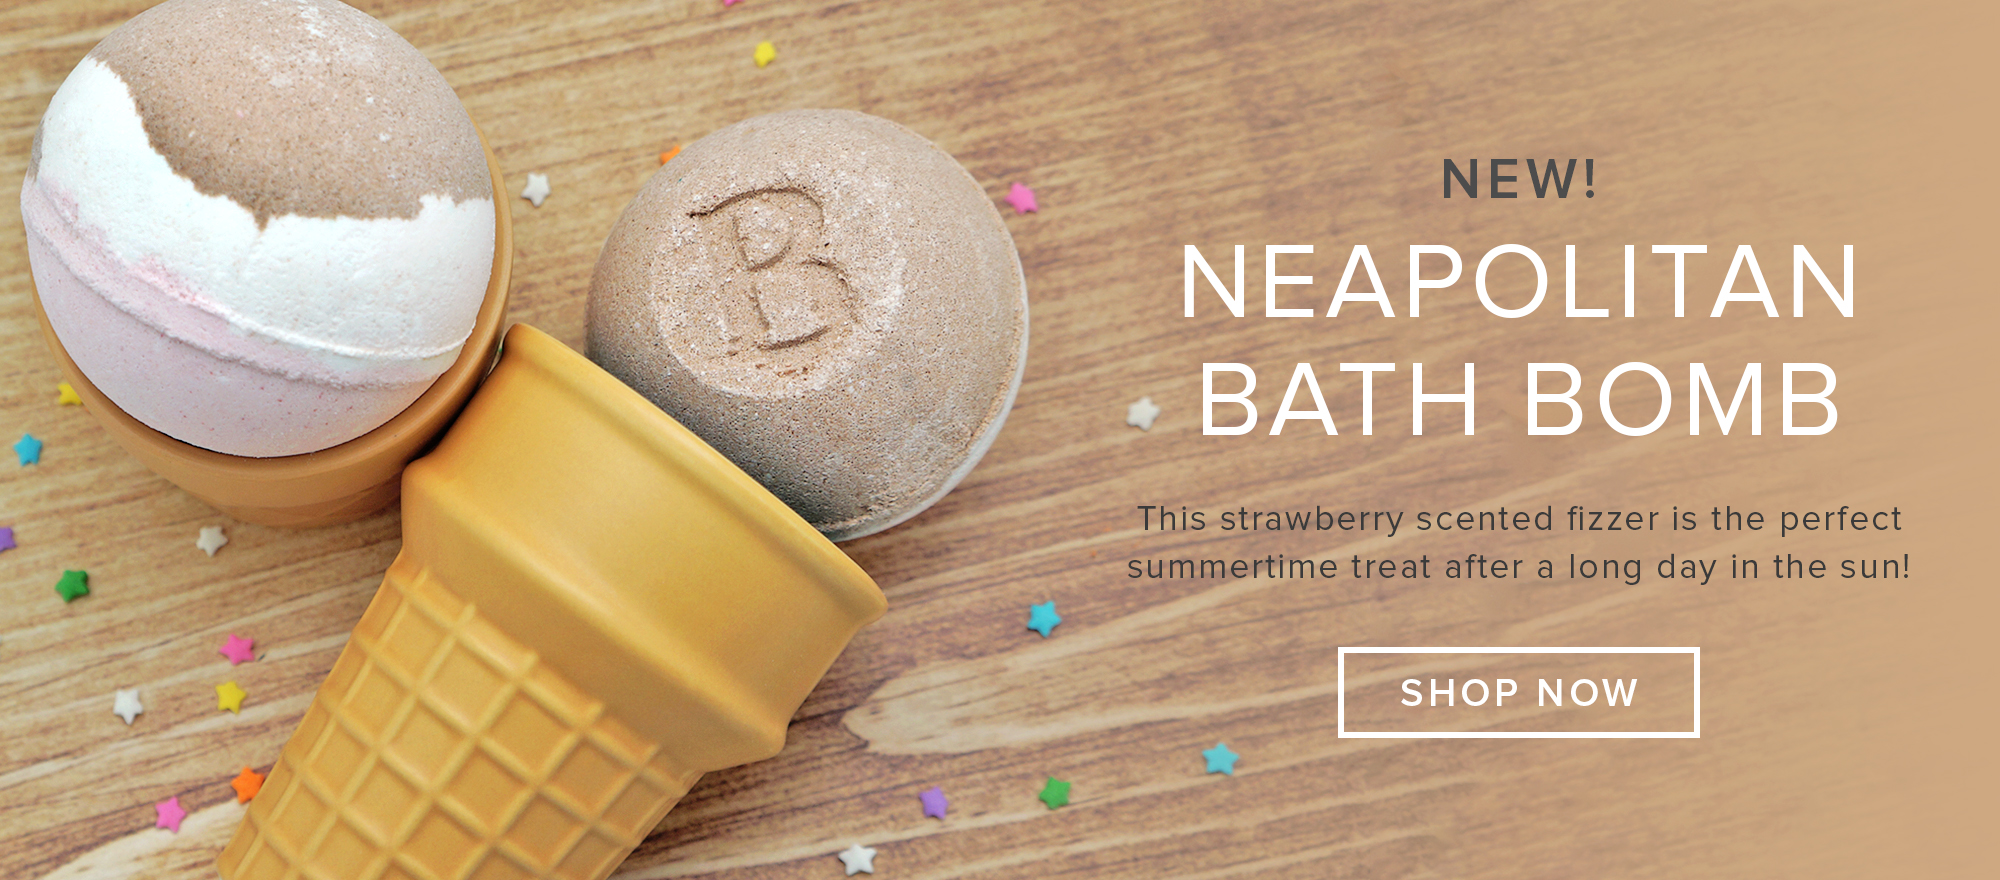 NEW Neapolitan Bath Bomb